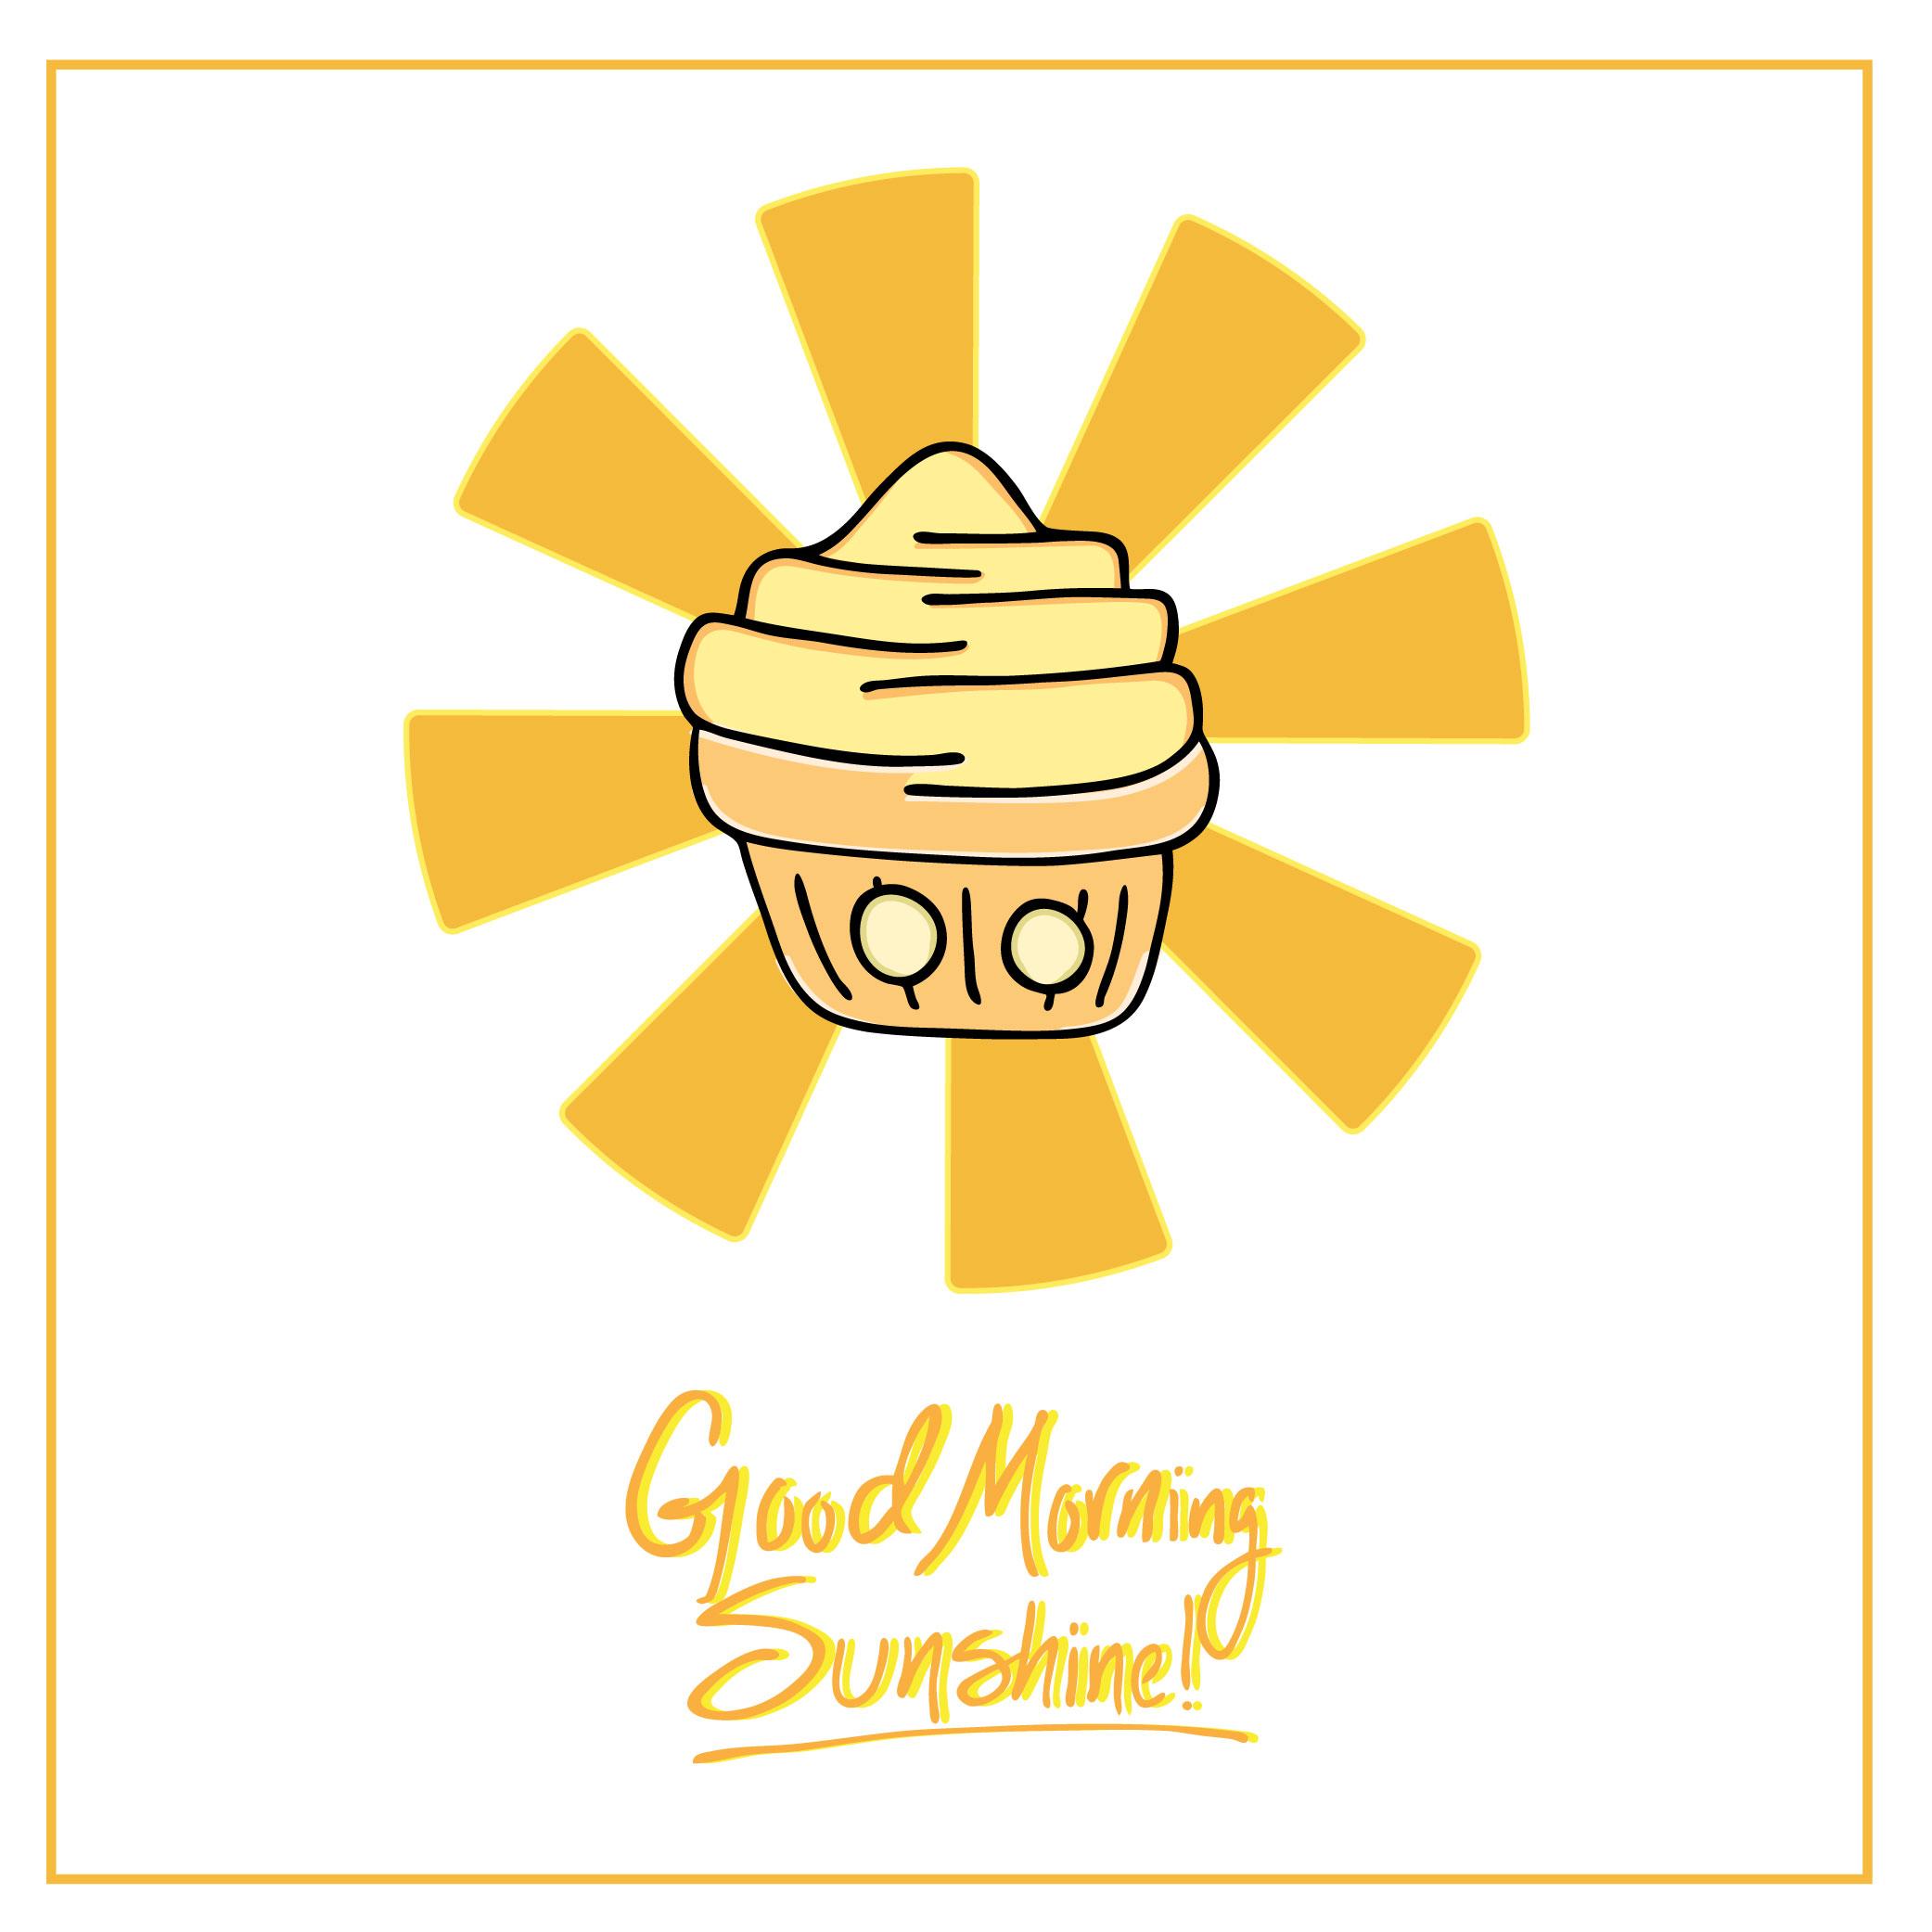 Good-Morning-Sunshine-Squared-01.jpg